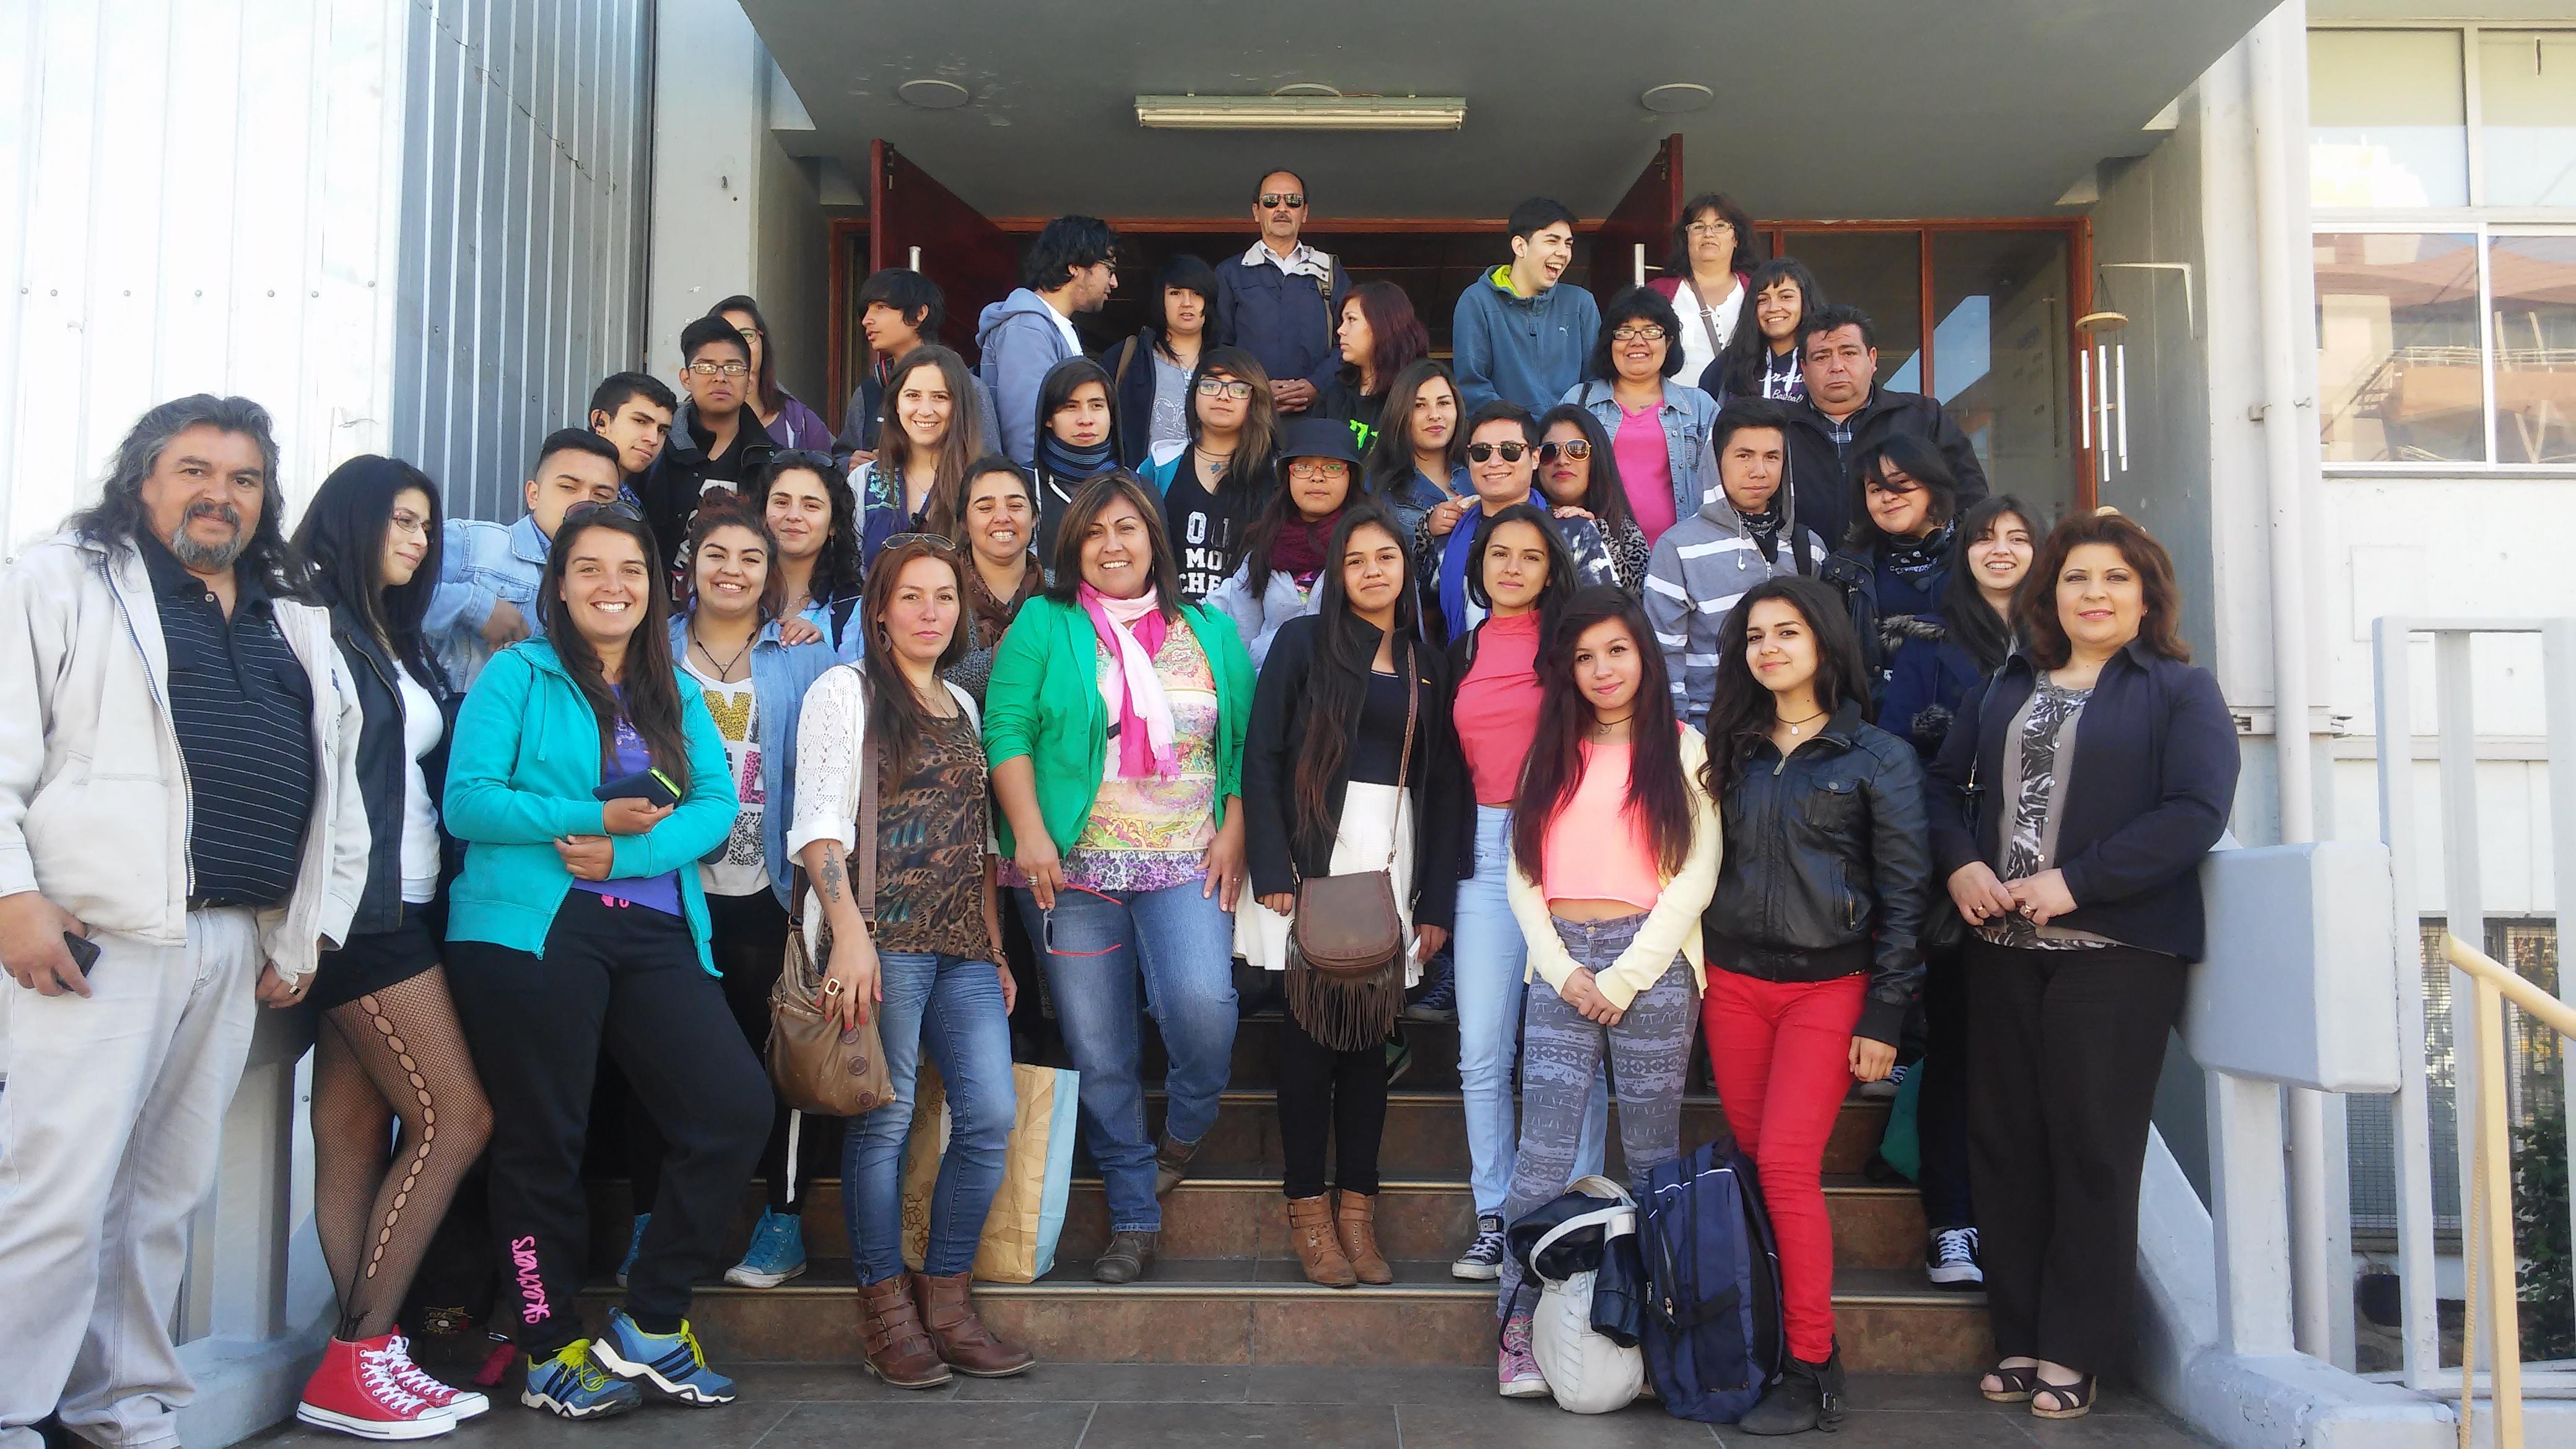 Grupo Viaje a Tololo